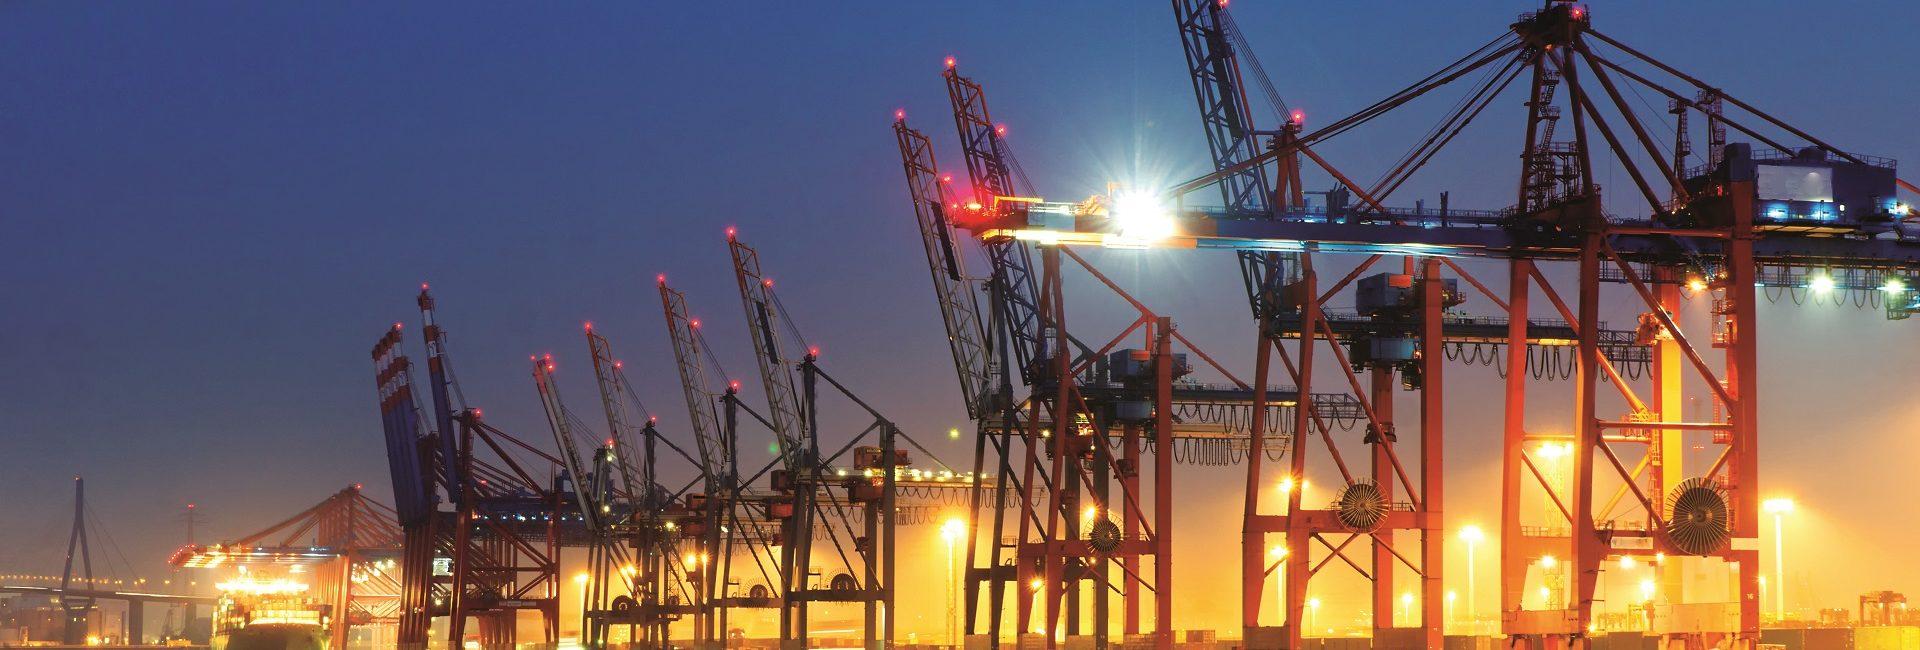 Dockyard Cranes 1920 by 1278